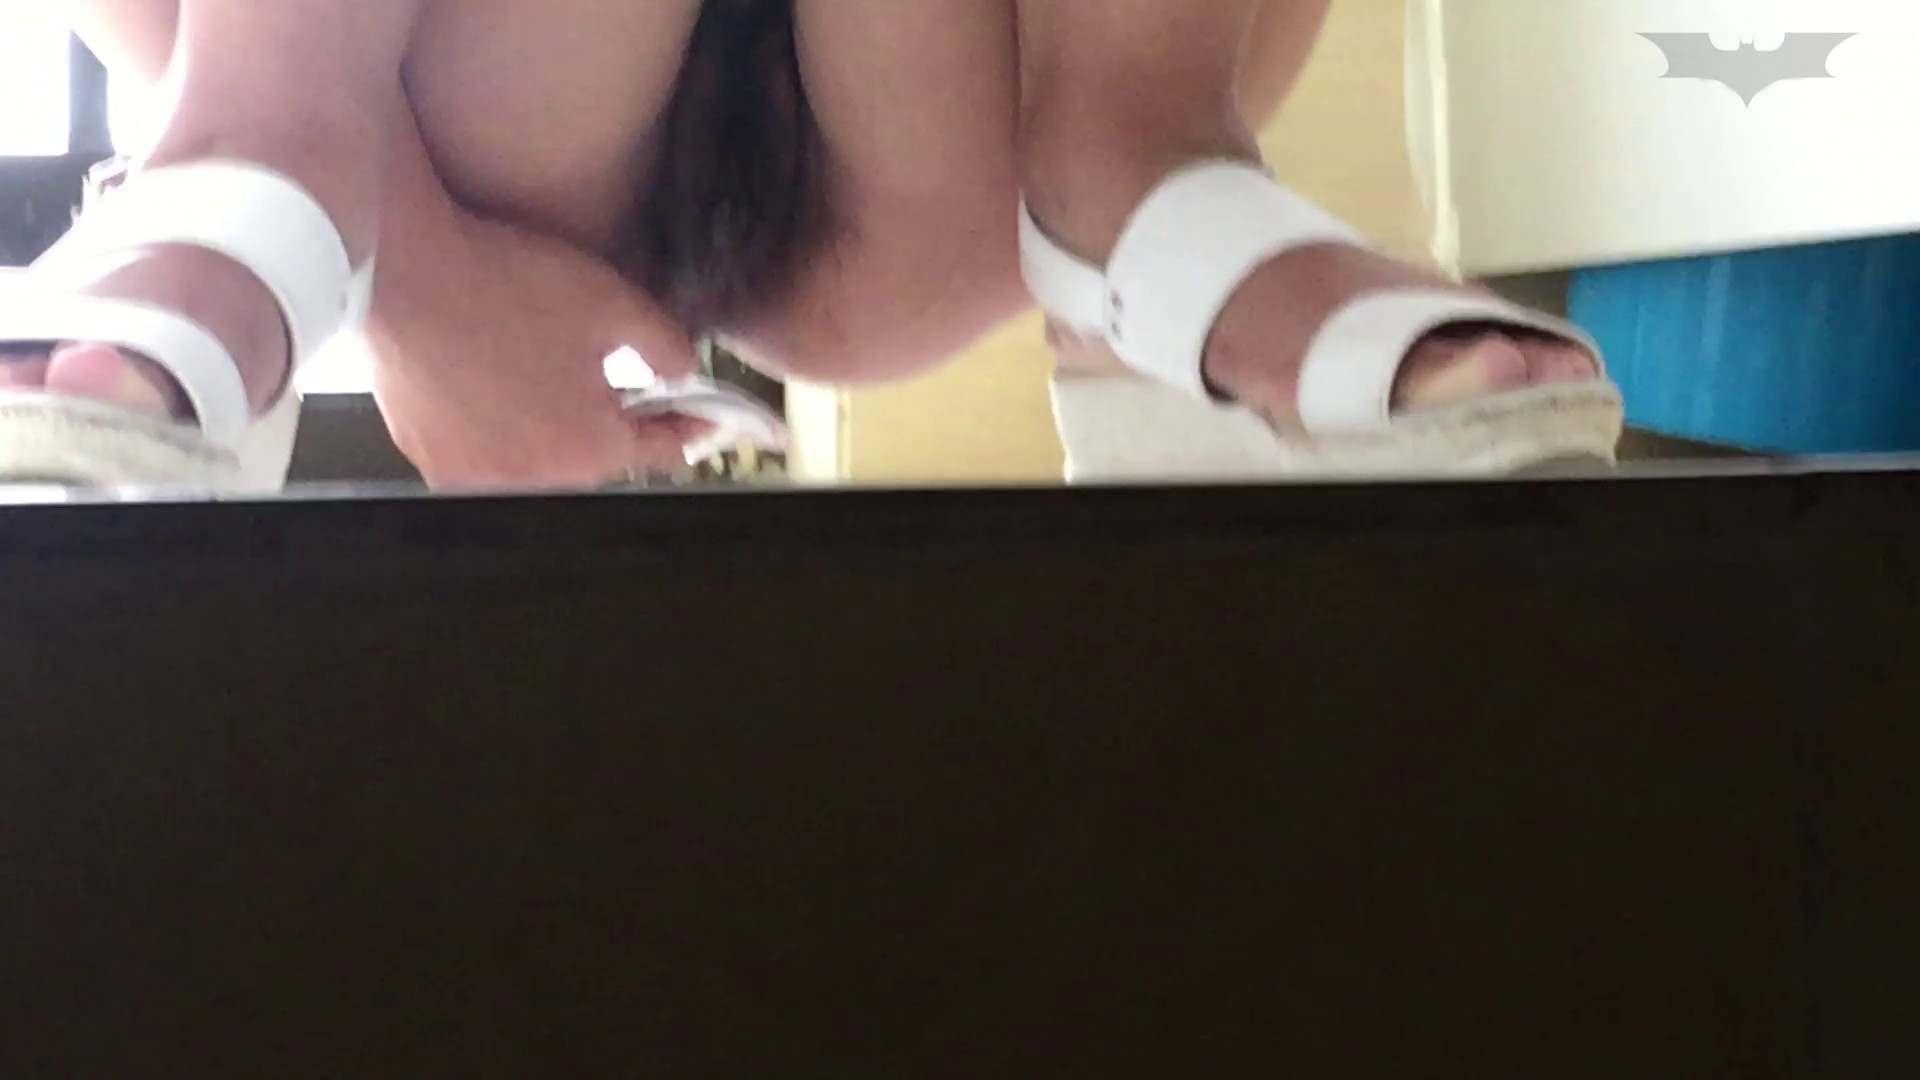 JD盗撮 美女の洗面所の秘密 Vol.66 美肌 セックス無修正動画無料 110枚 92